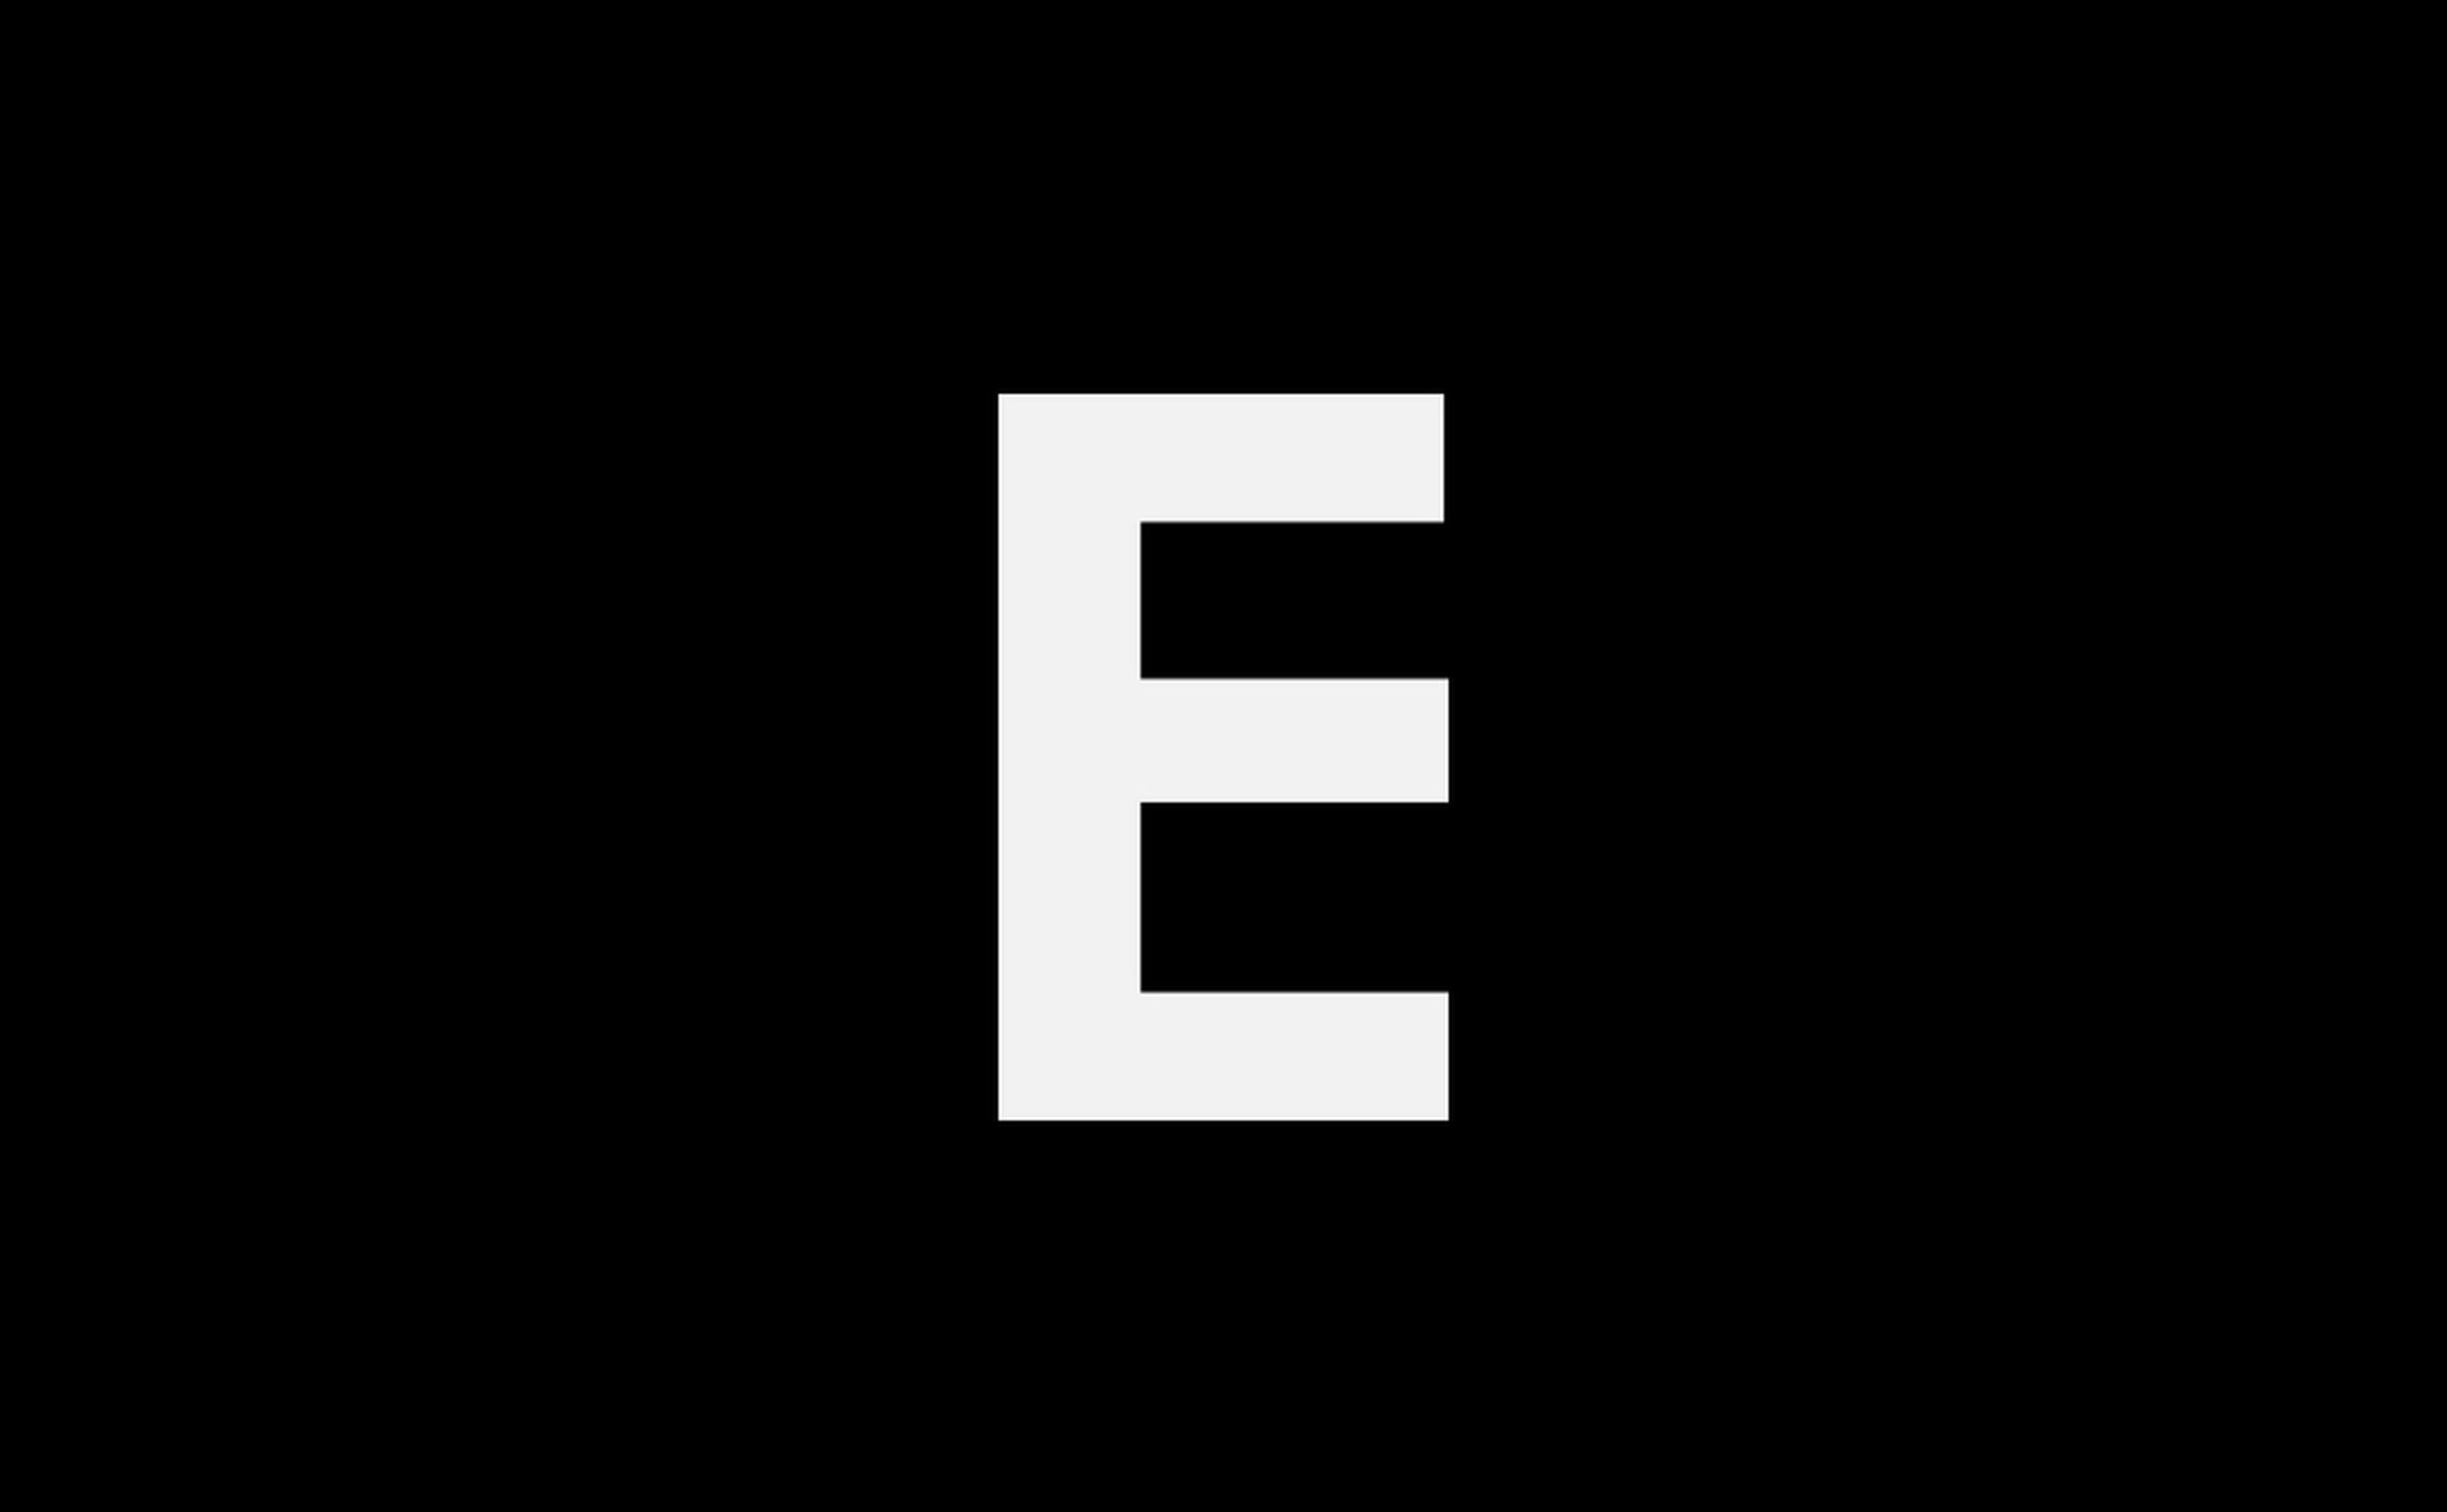 purple, indoors, architecture, built structure, no people, night, illuminated